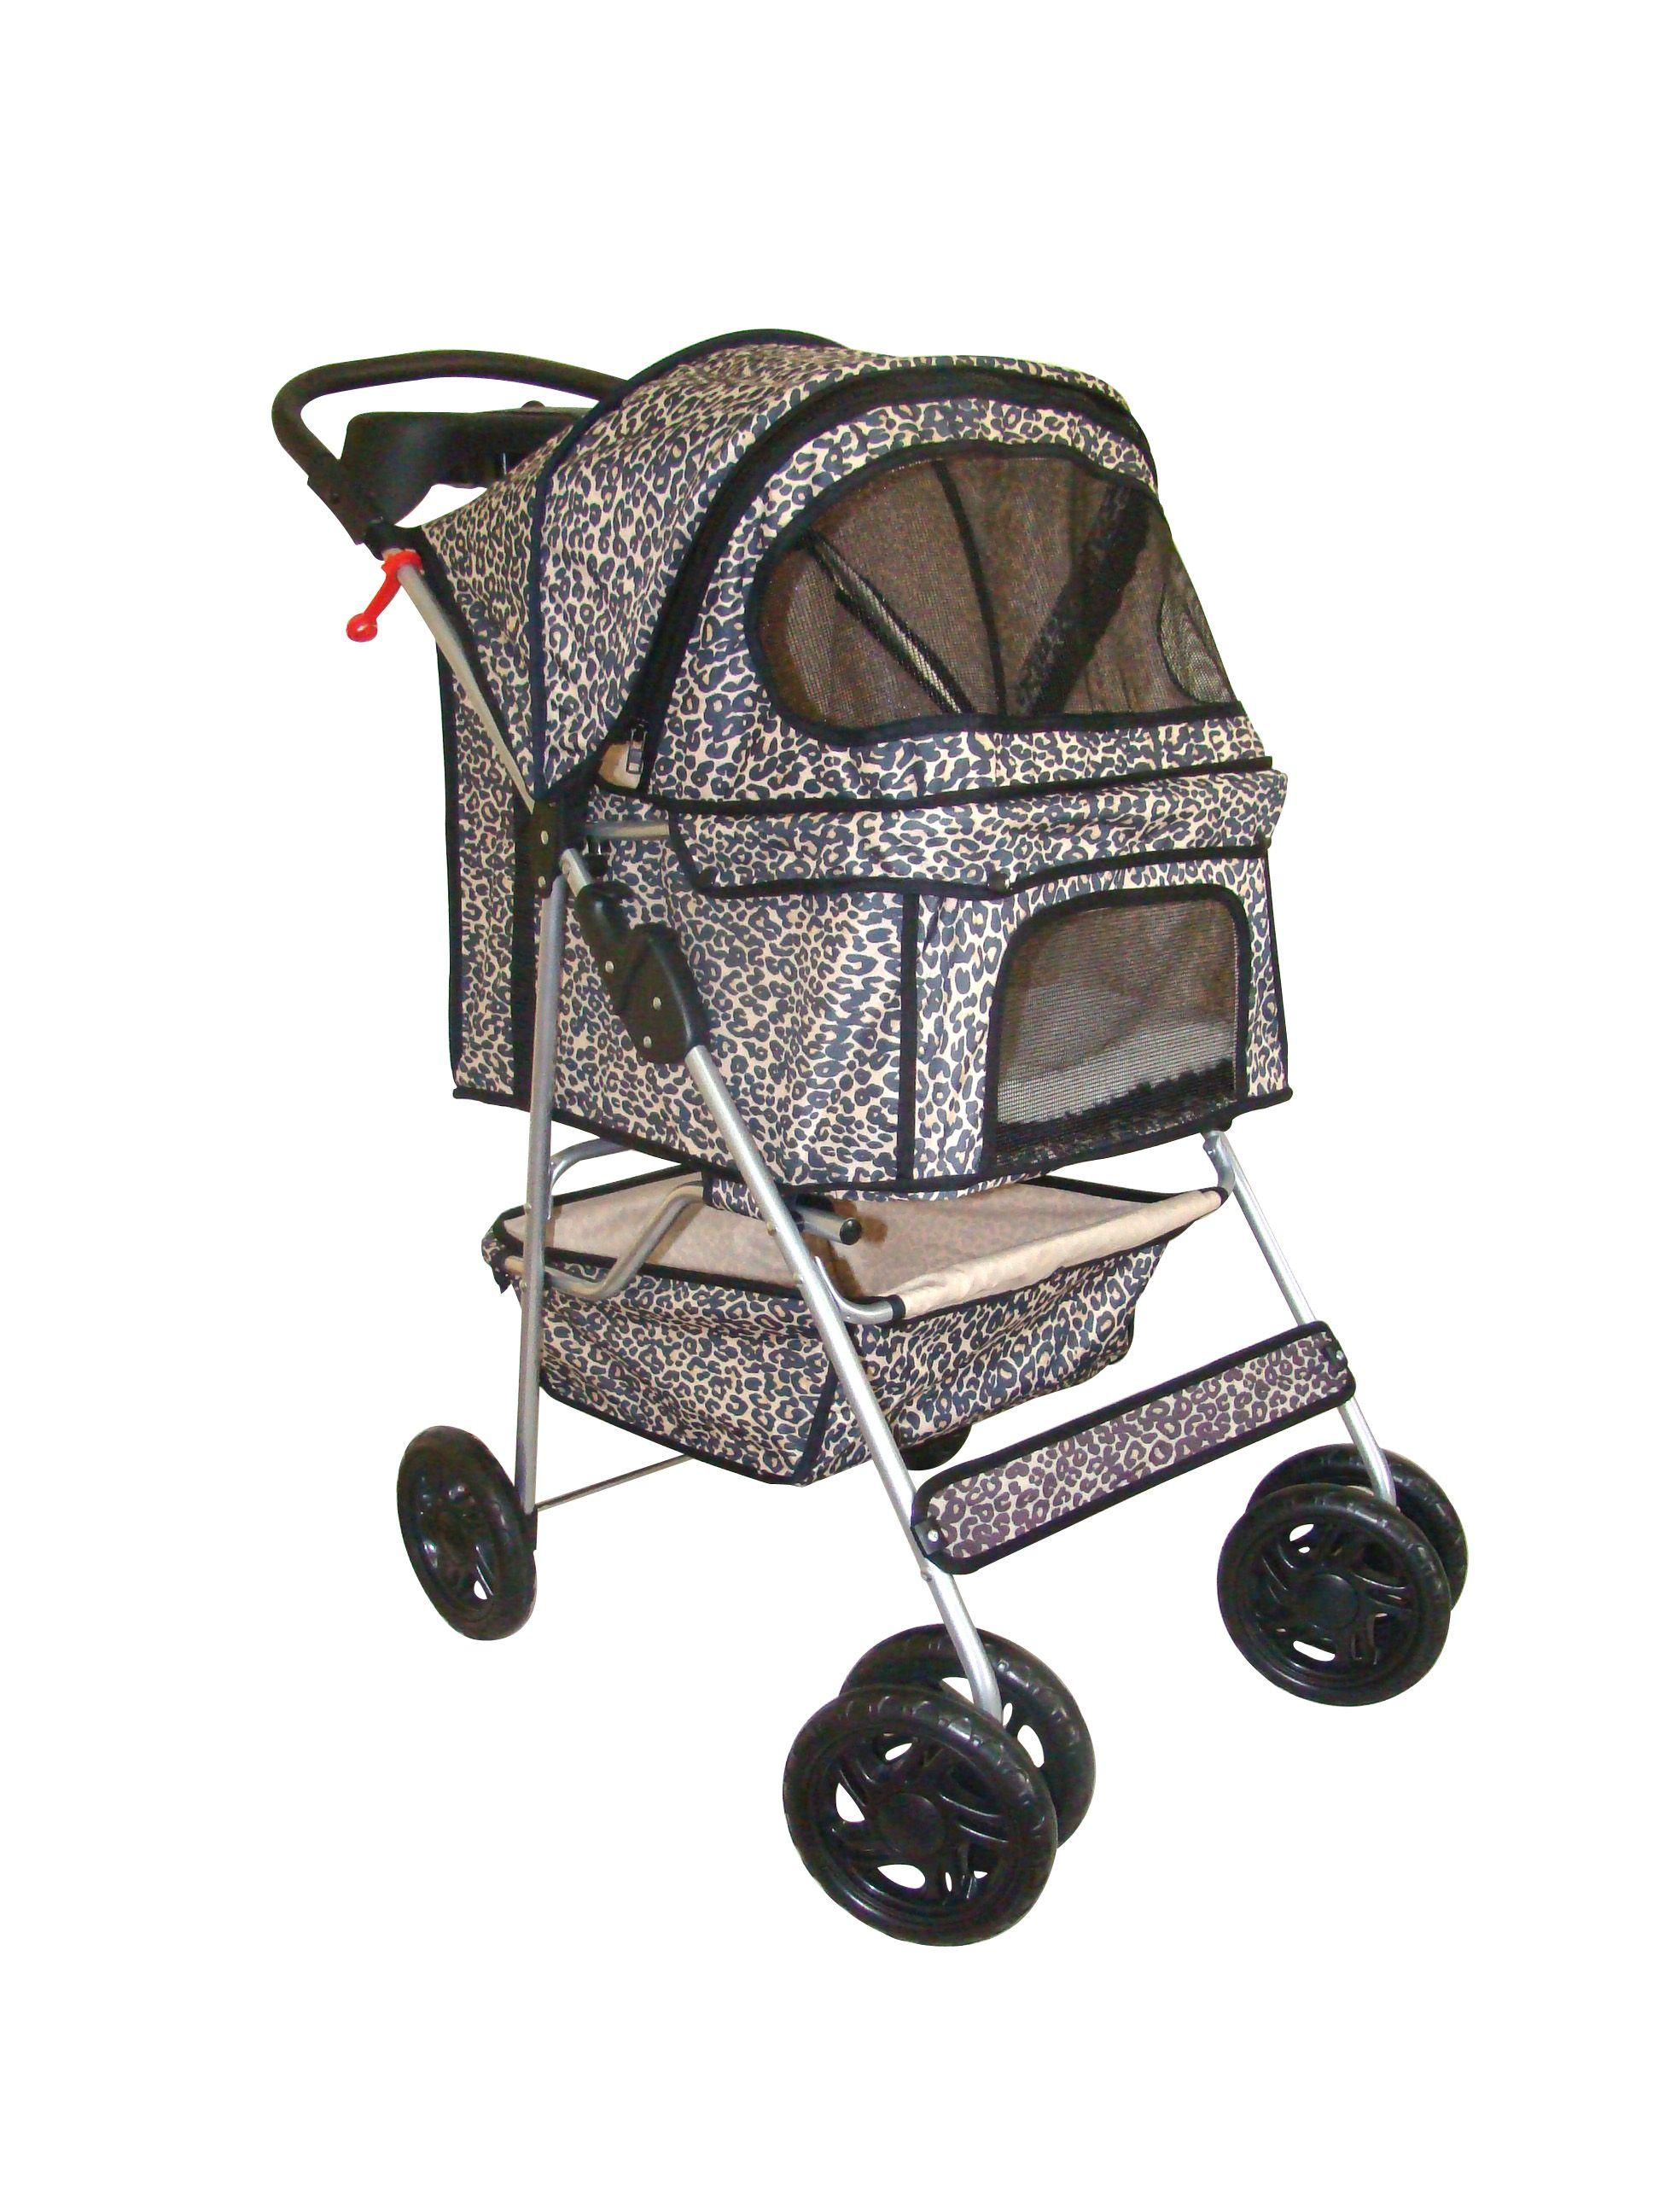 Leopard Print 4 Wheels Dog Stroller (BestPet) Dog